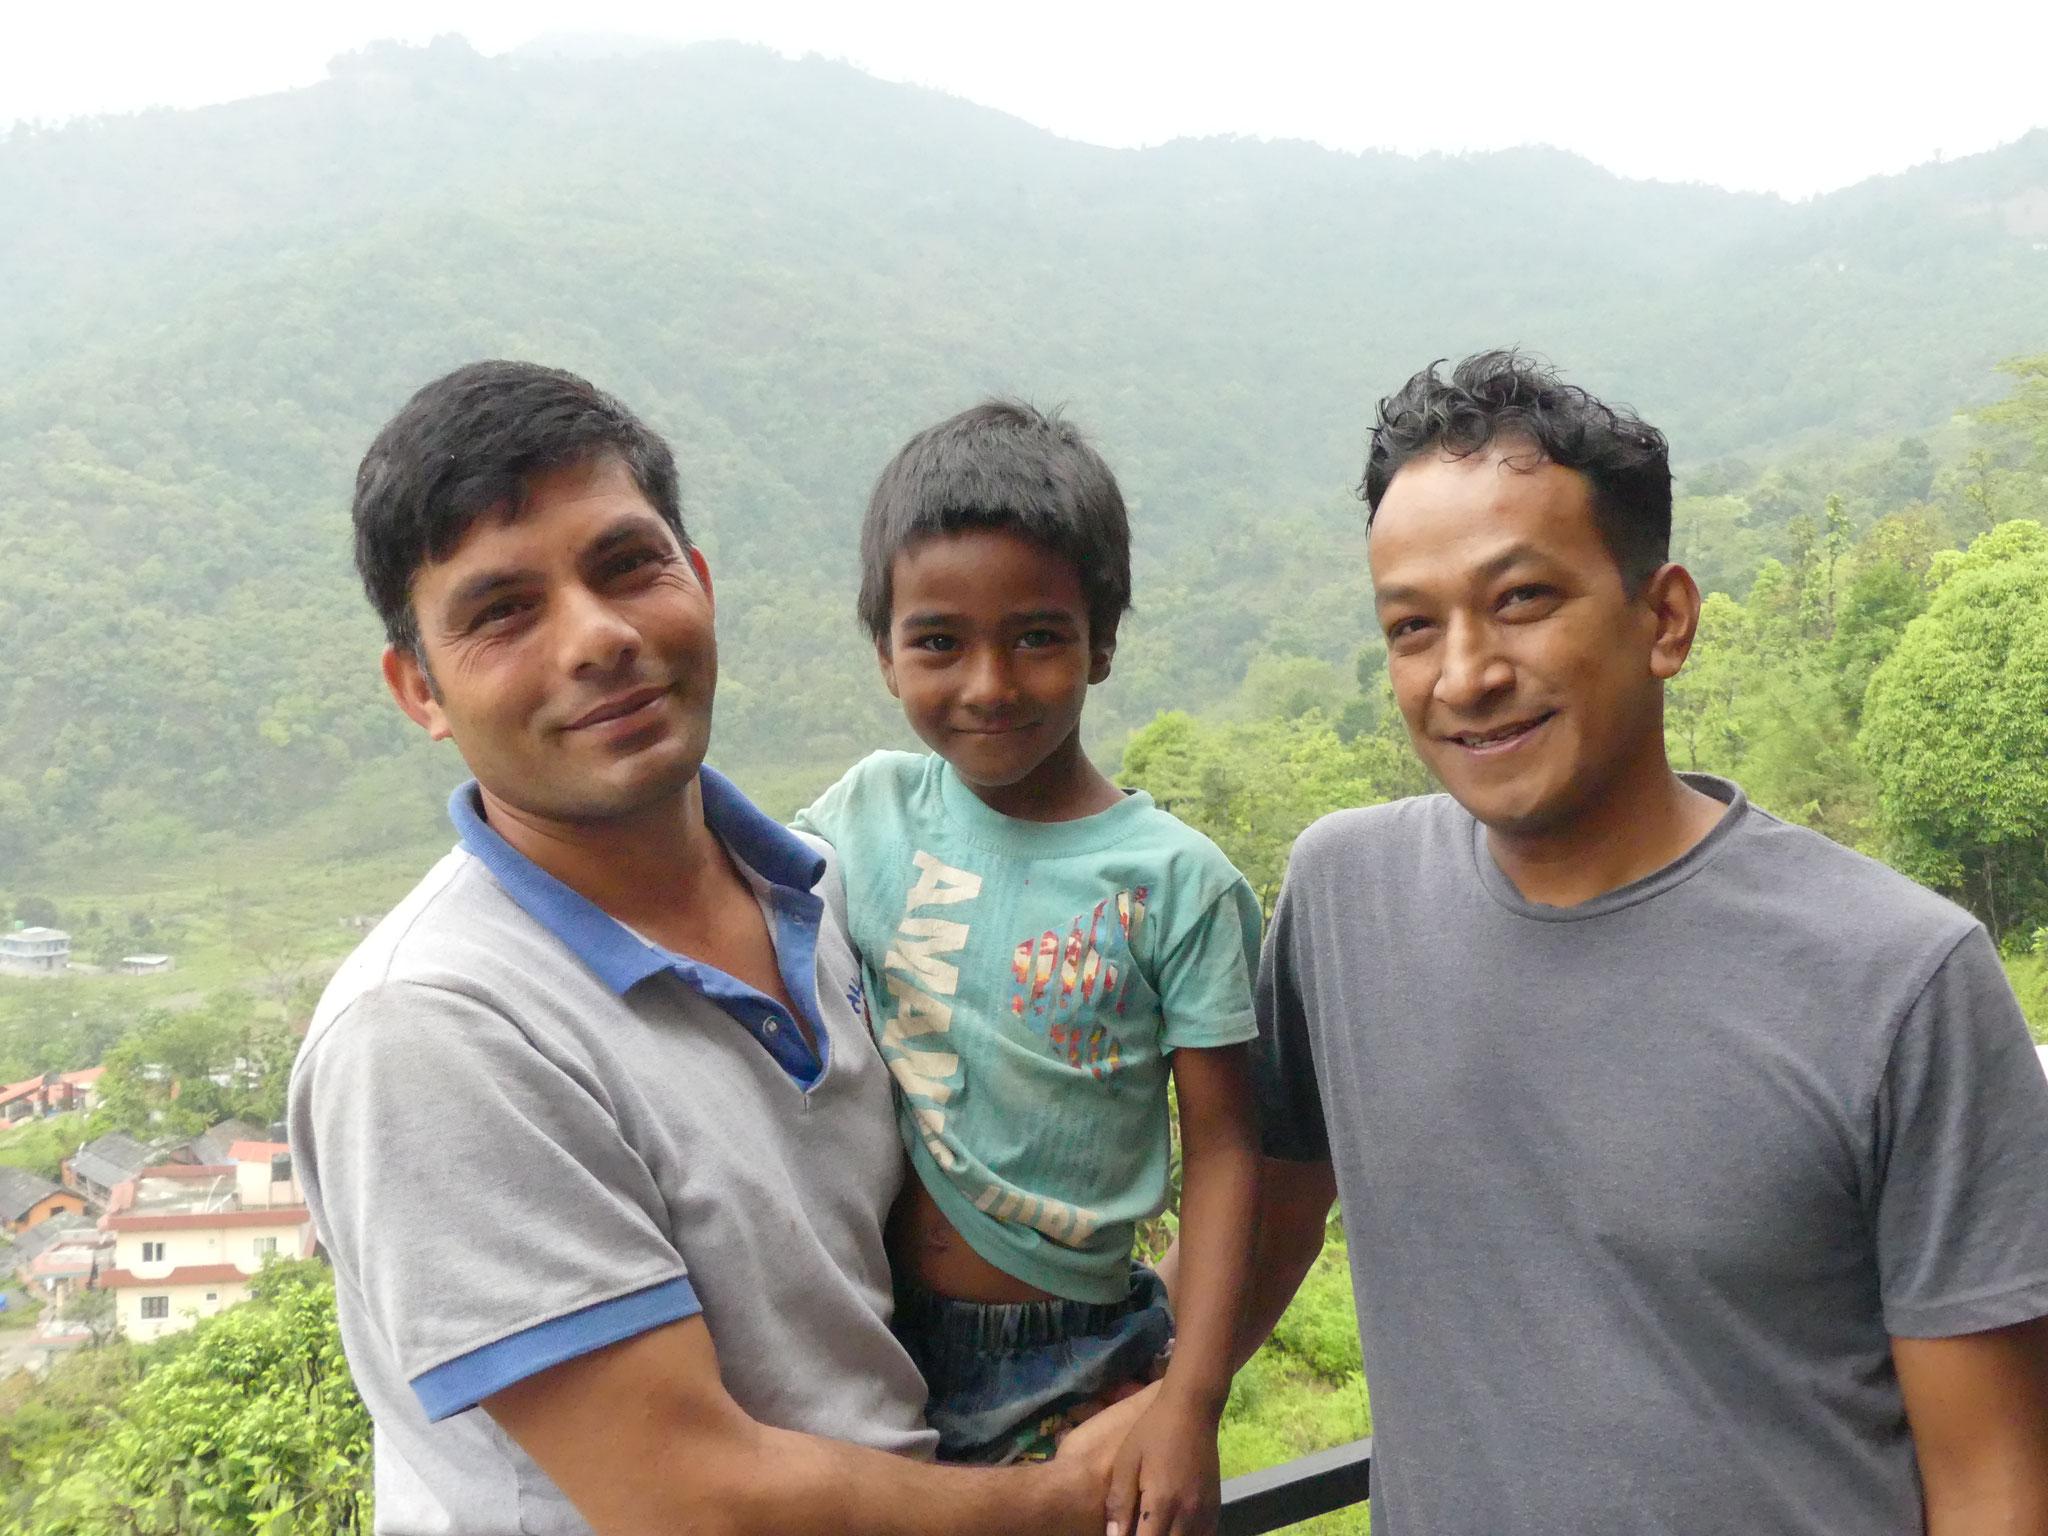 Bildung für Nepal - Govinda, Sumit, Manohar